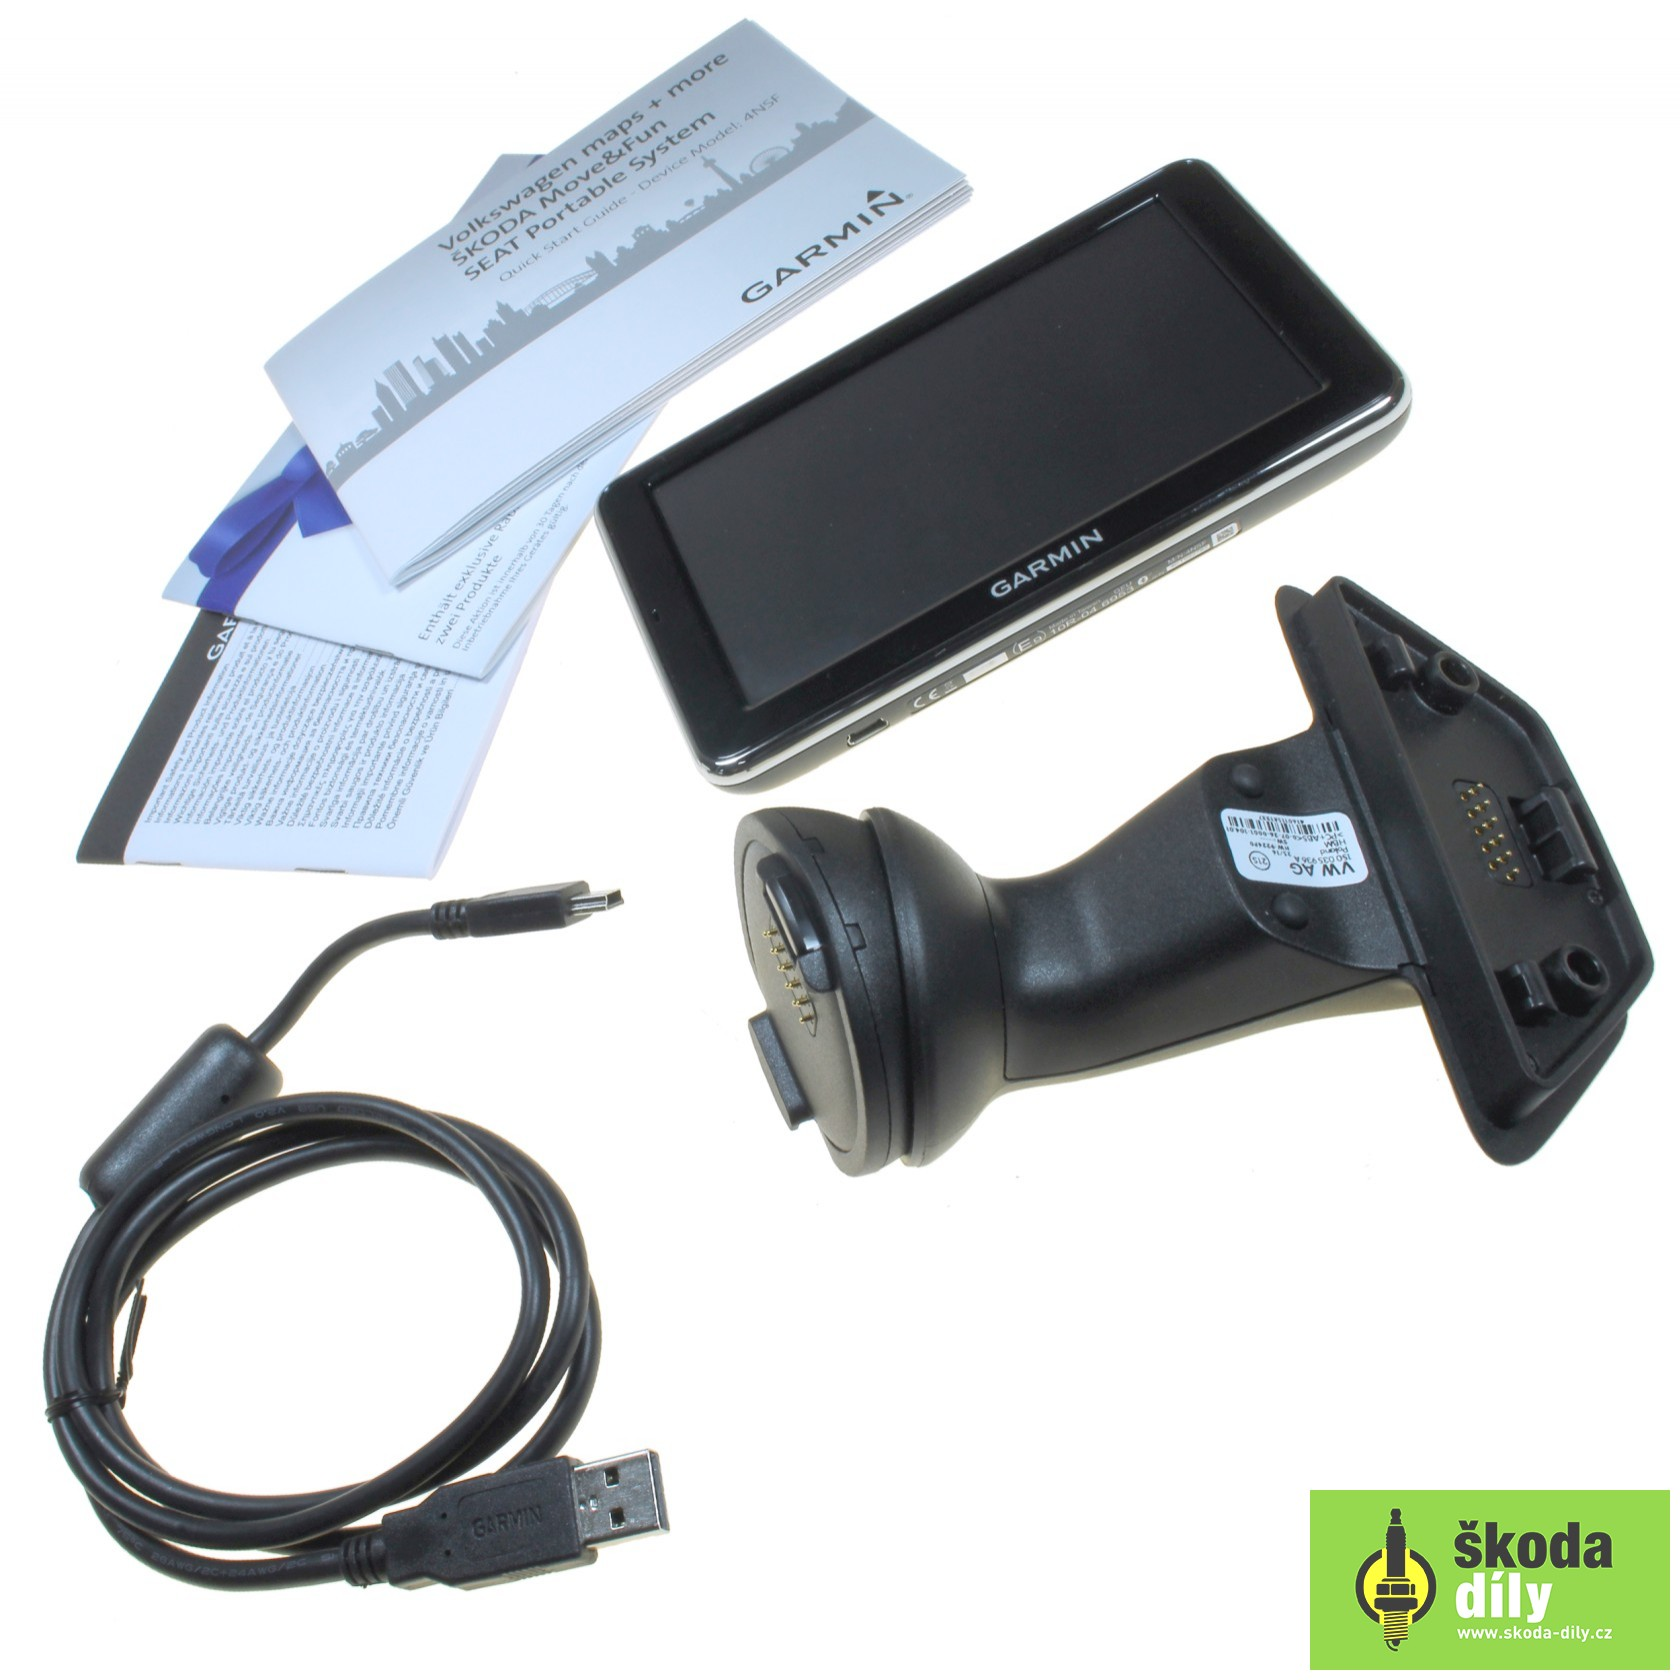 Move Fun Navigation Koda 1st051235e Skoda Citigo Fuse Box Tip